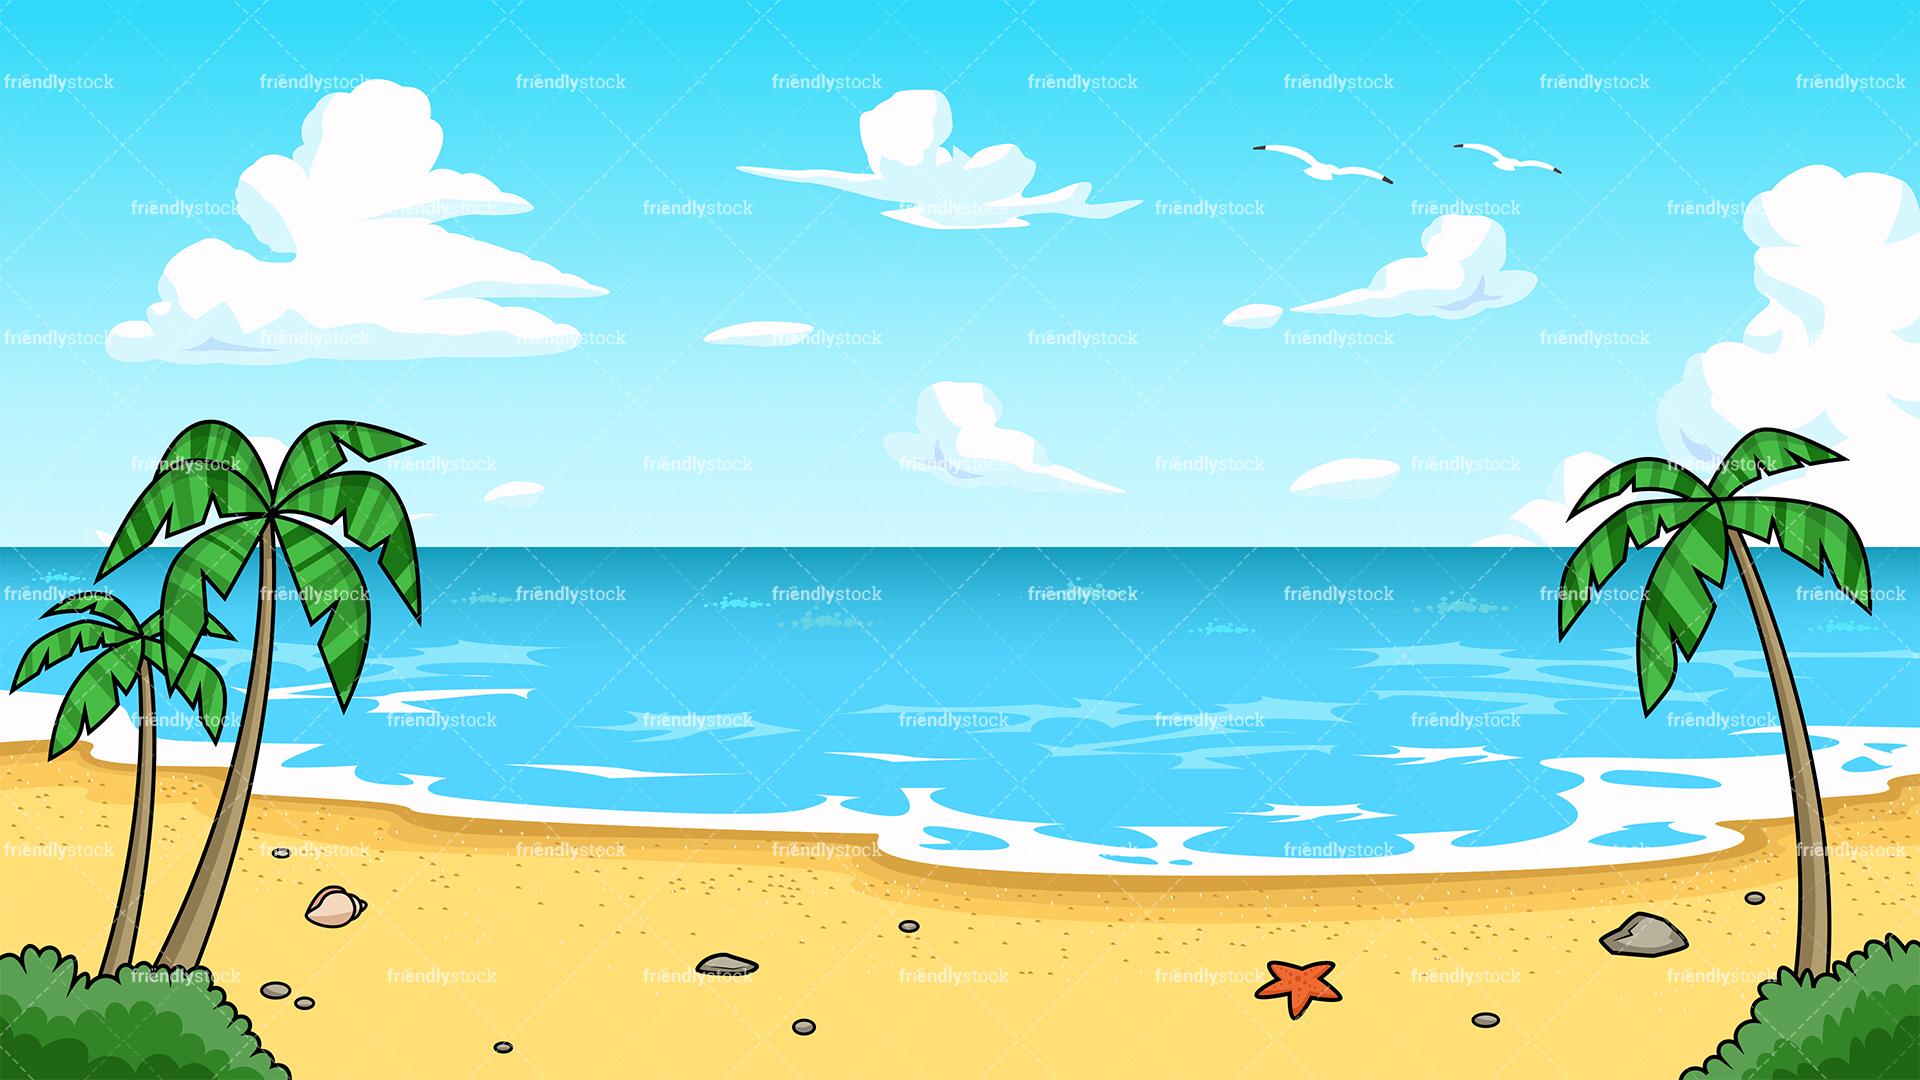 Beach cartoons clipart vector transparent stock beach cartoon - Honey & Denim vector transparent stock